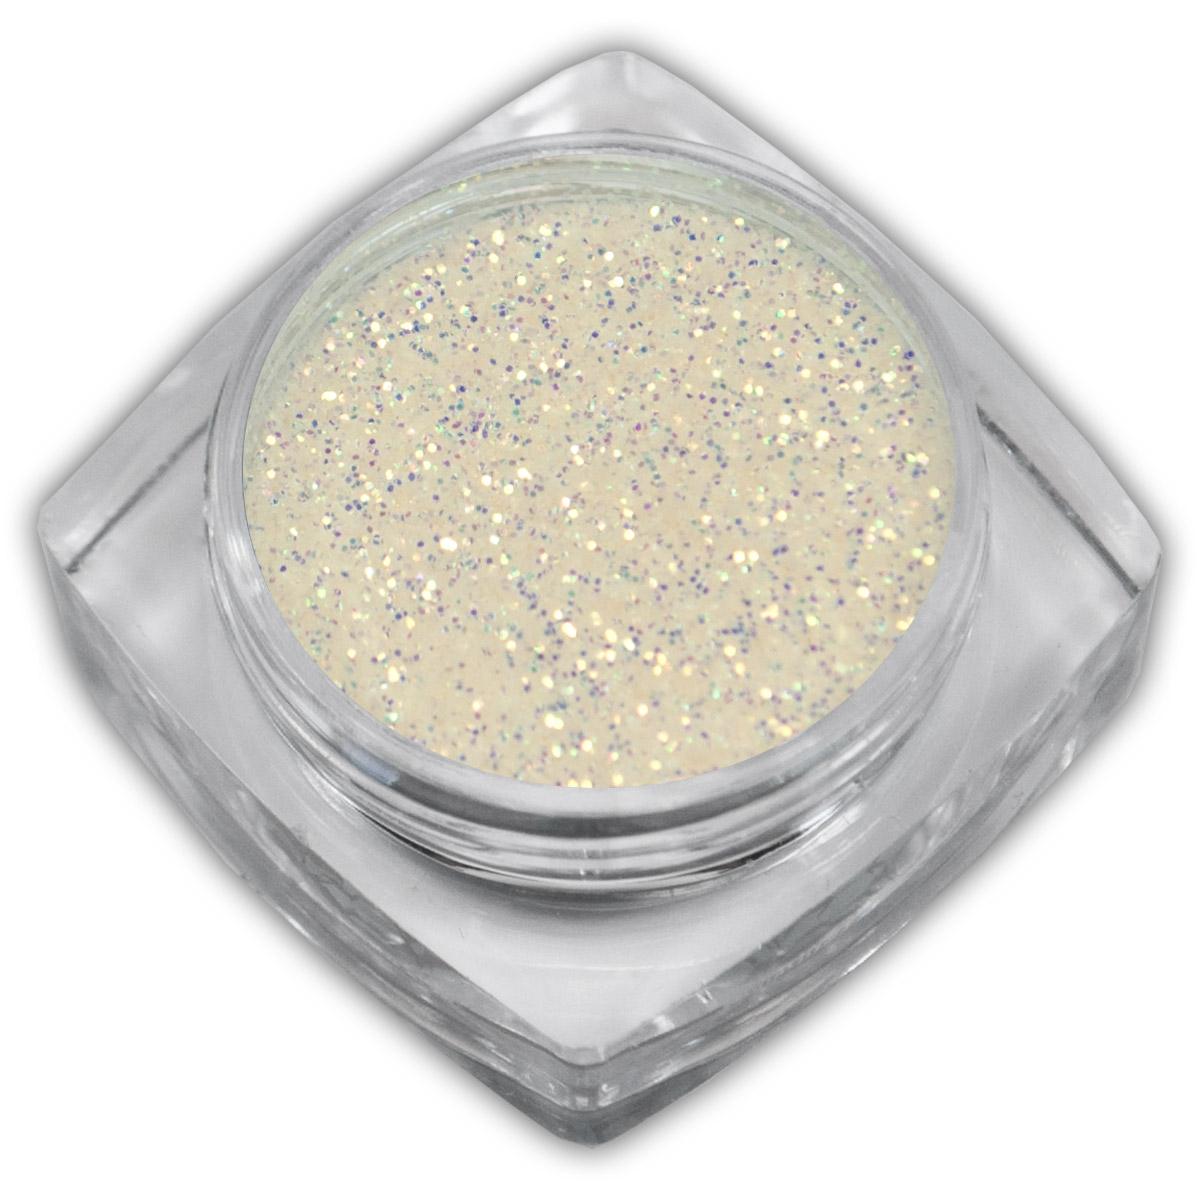 Funky Glitter Powder Rm Beautynails Nageldesign